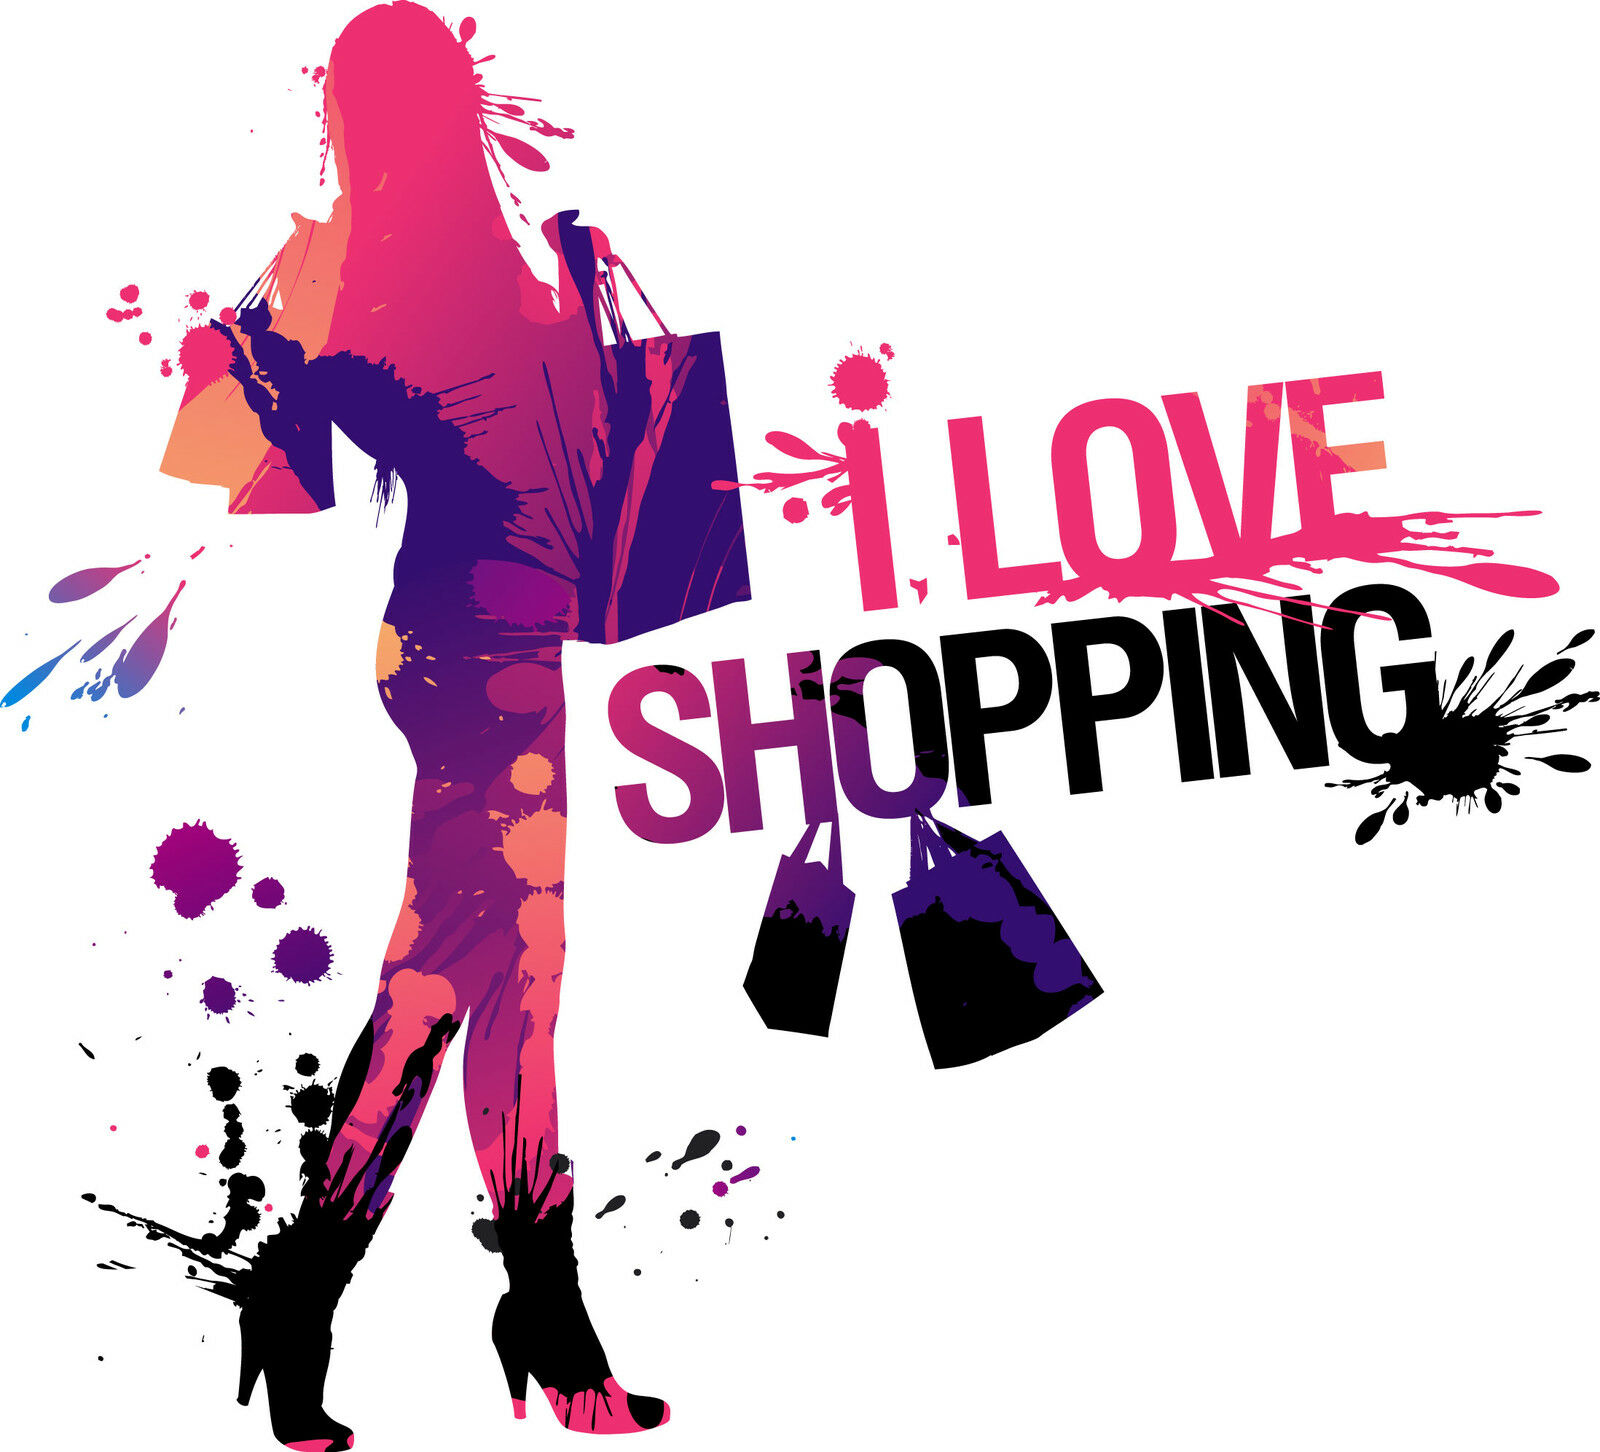 Shoppingforless